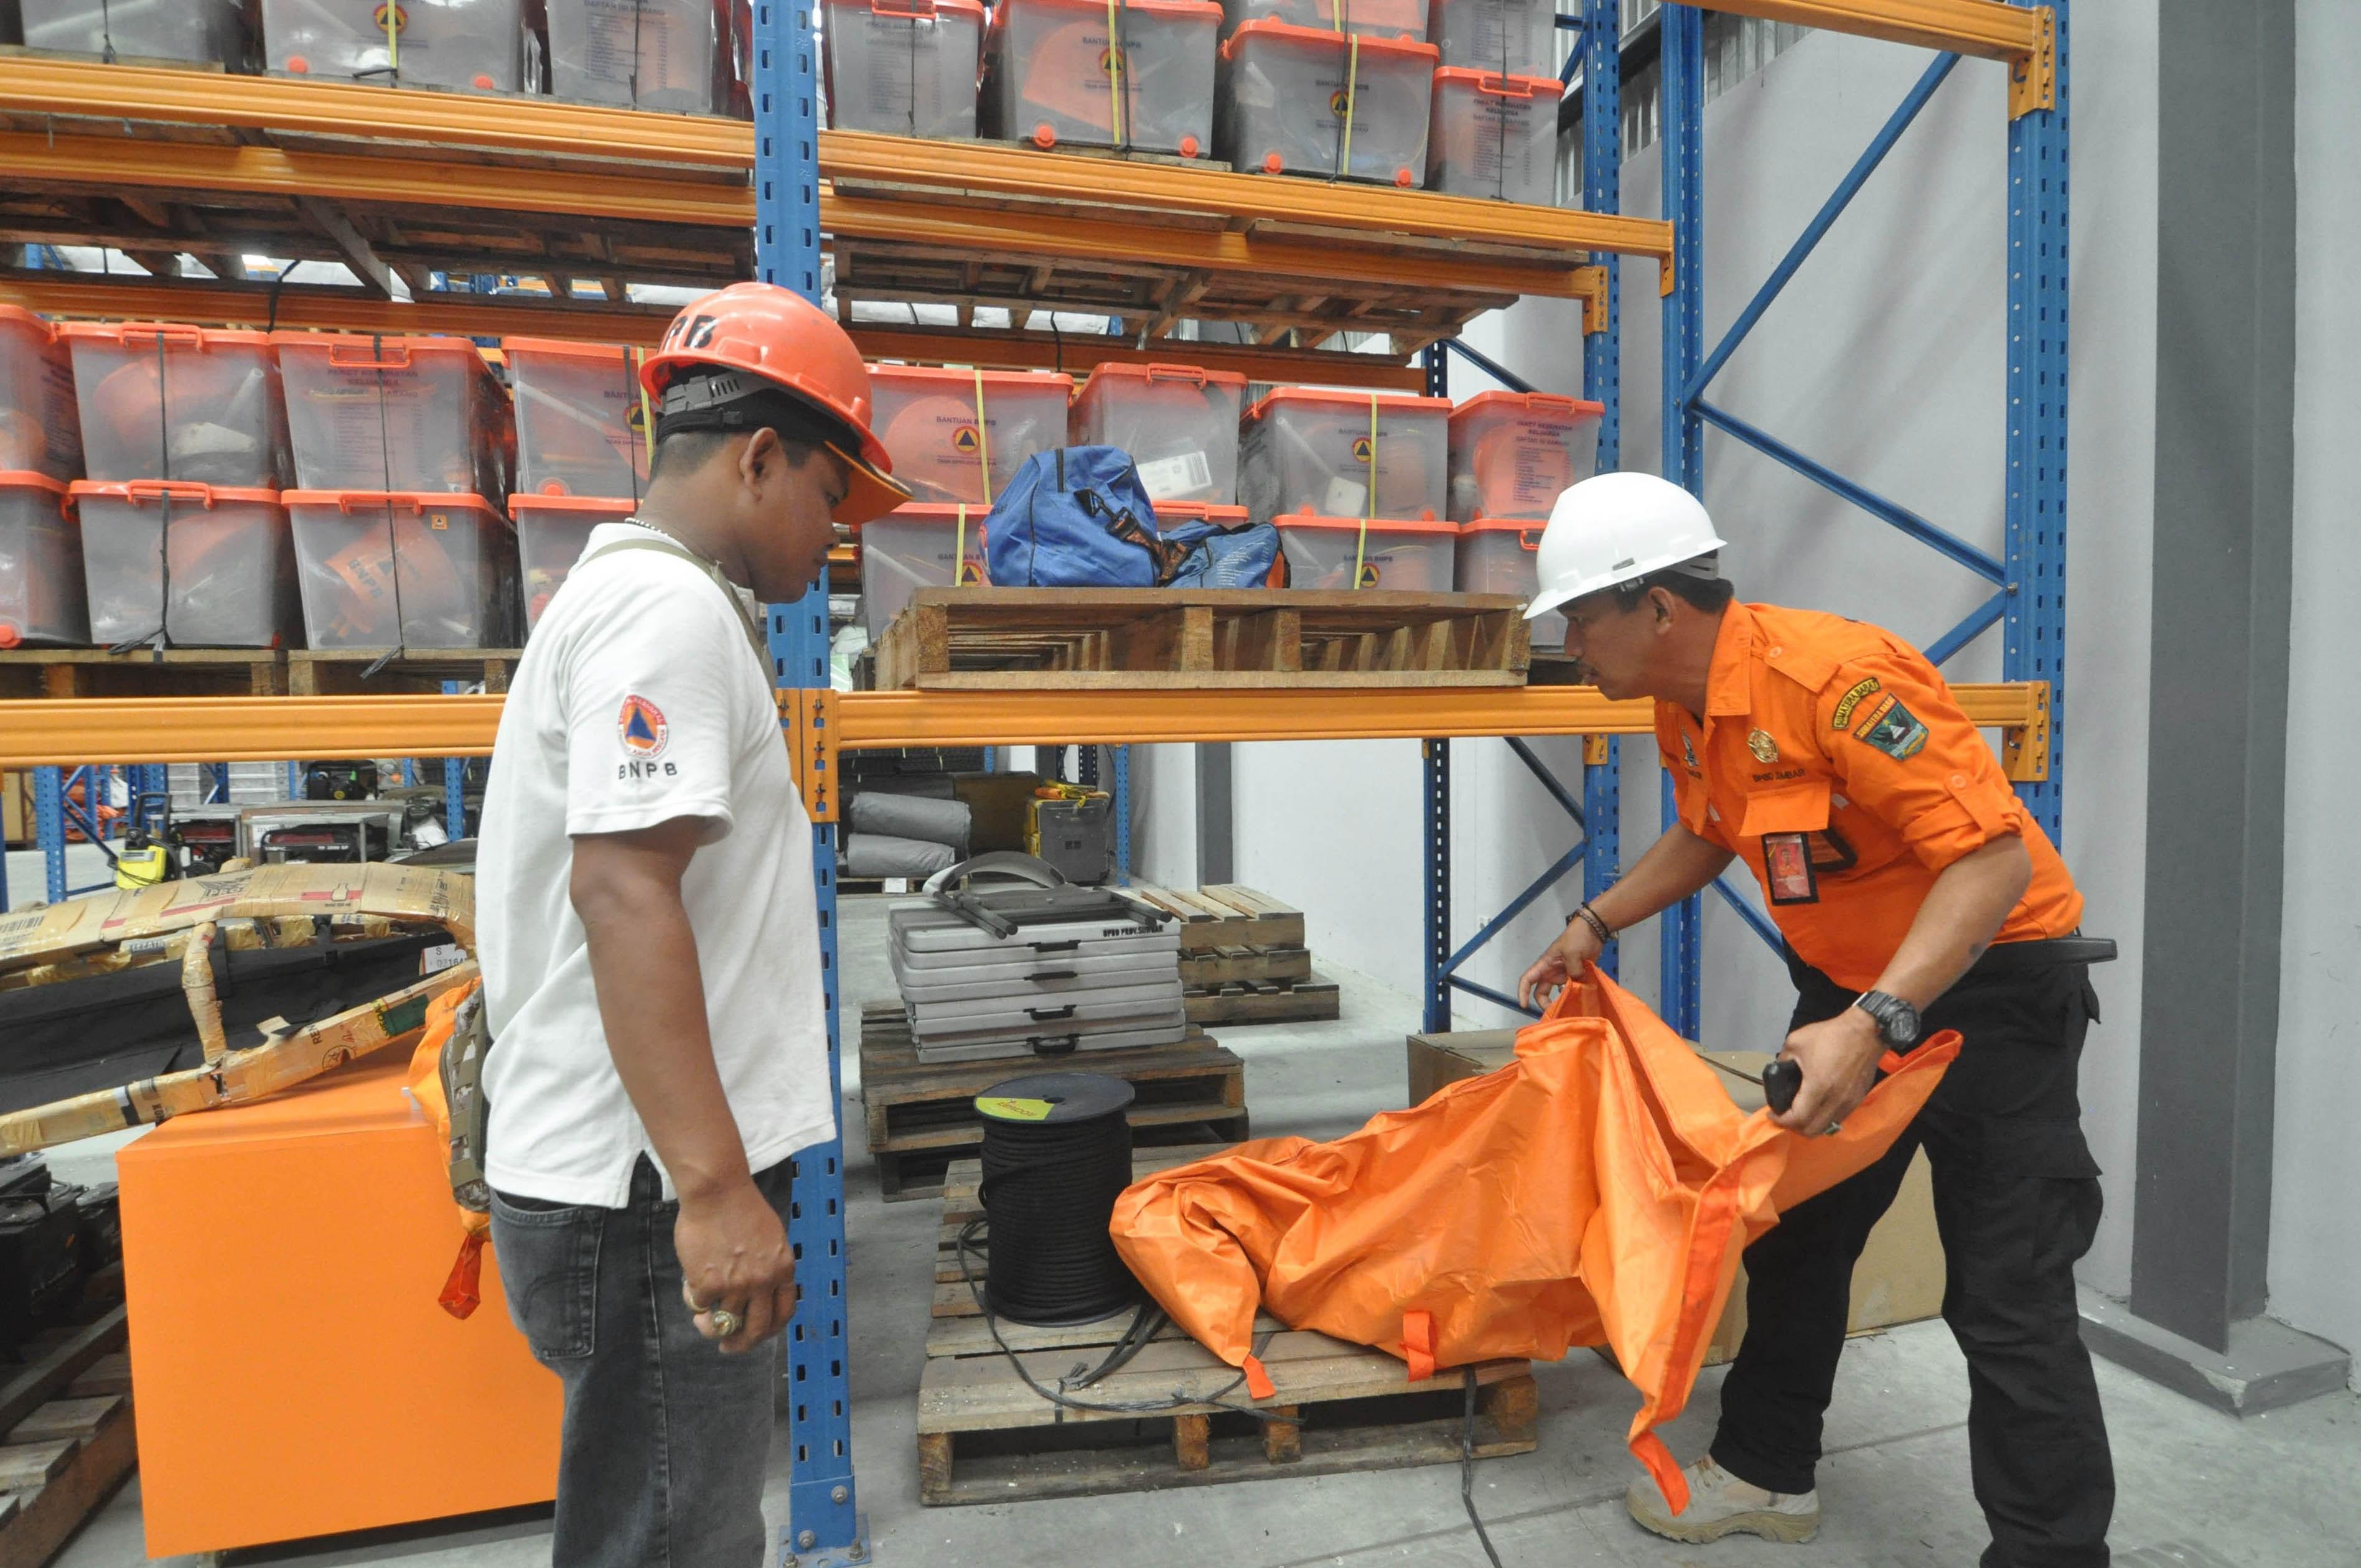 Indonesia issues tsunami warning after massive 7.9 magnitude quake